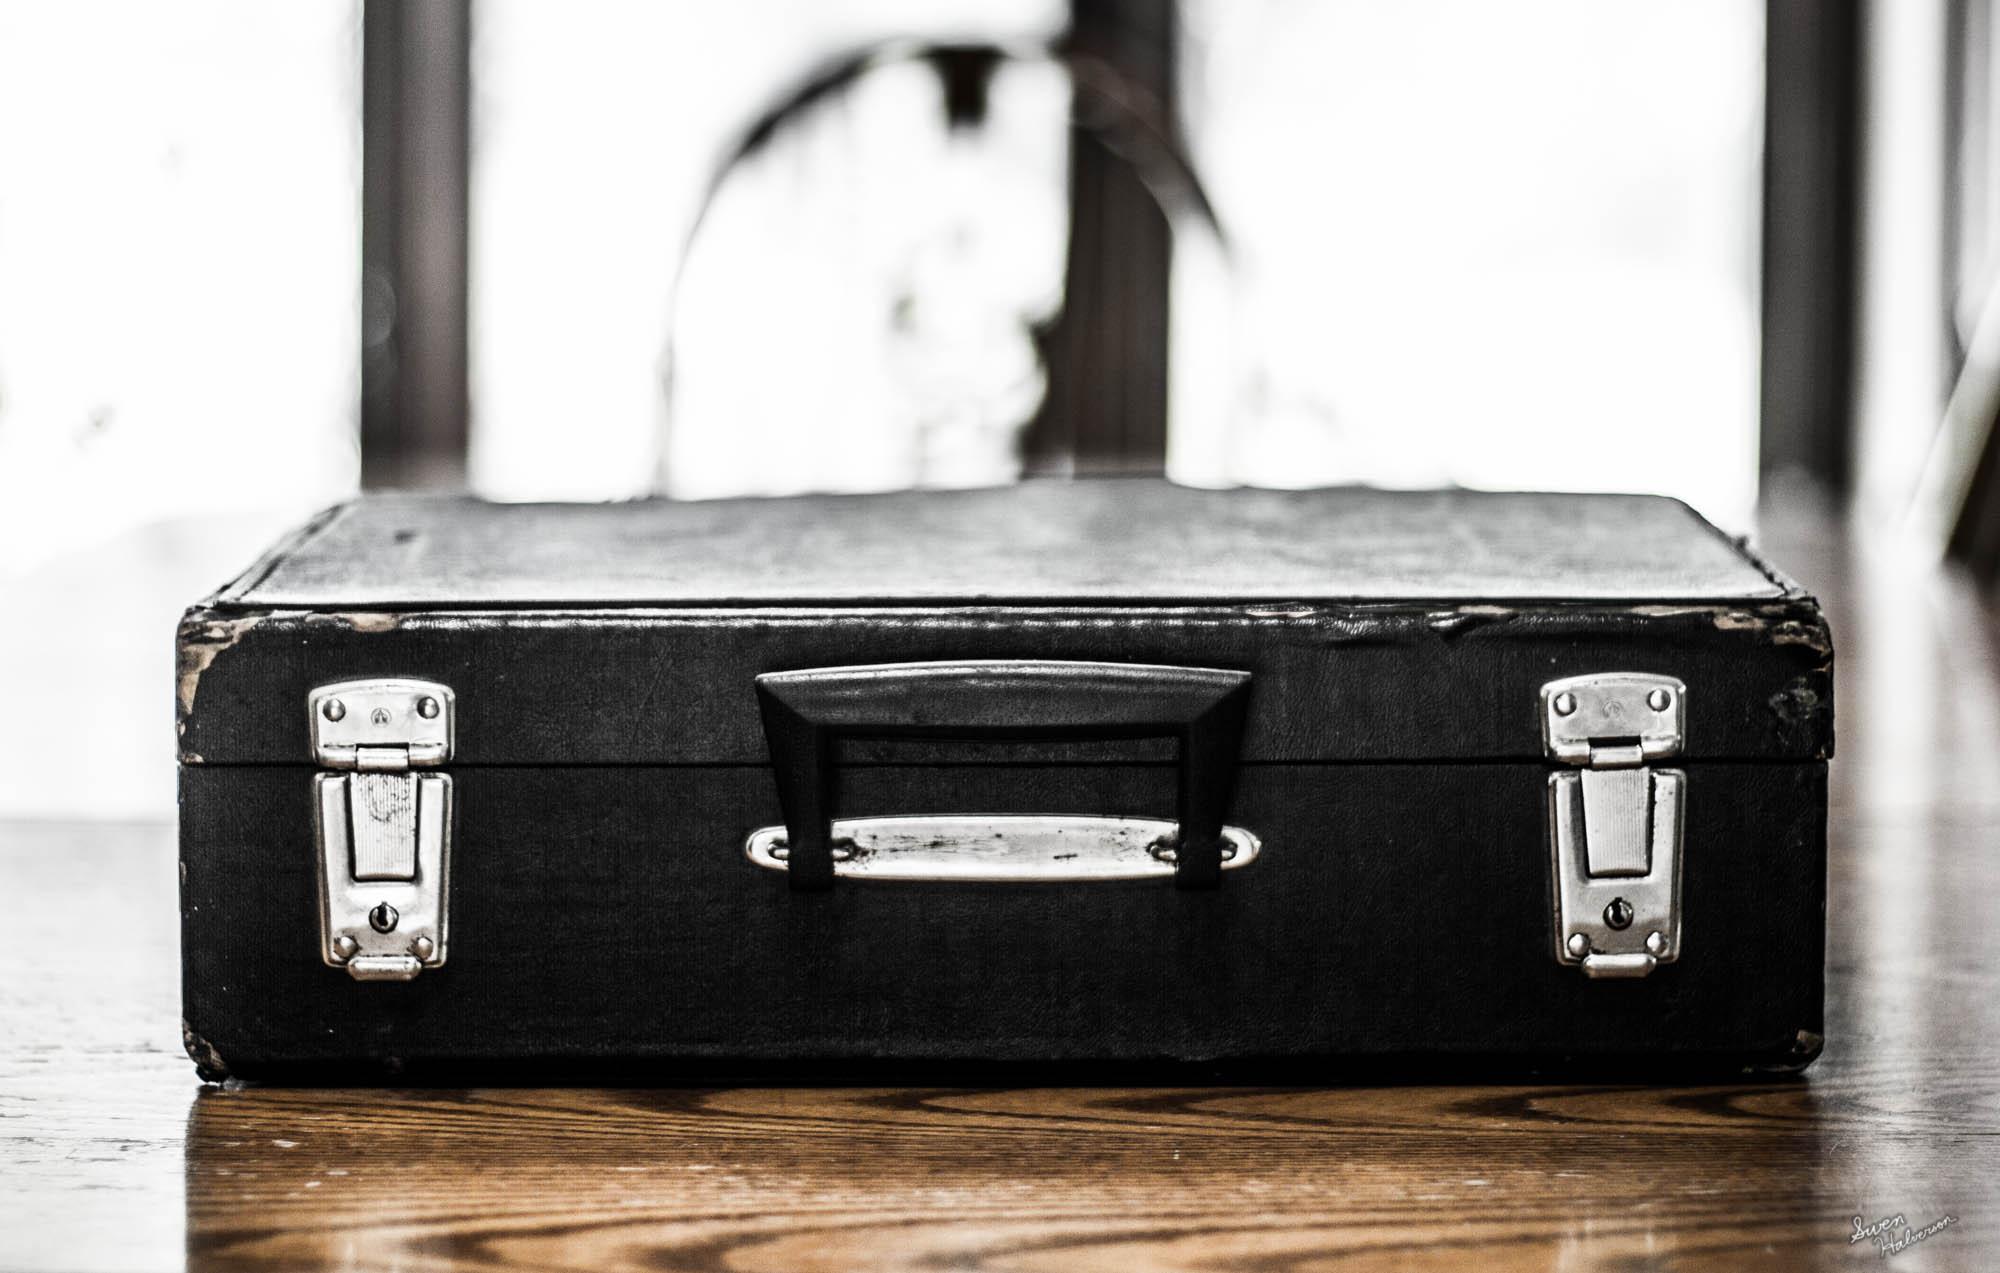 Theme: Briefcase |Title: A Briefcase Closed